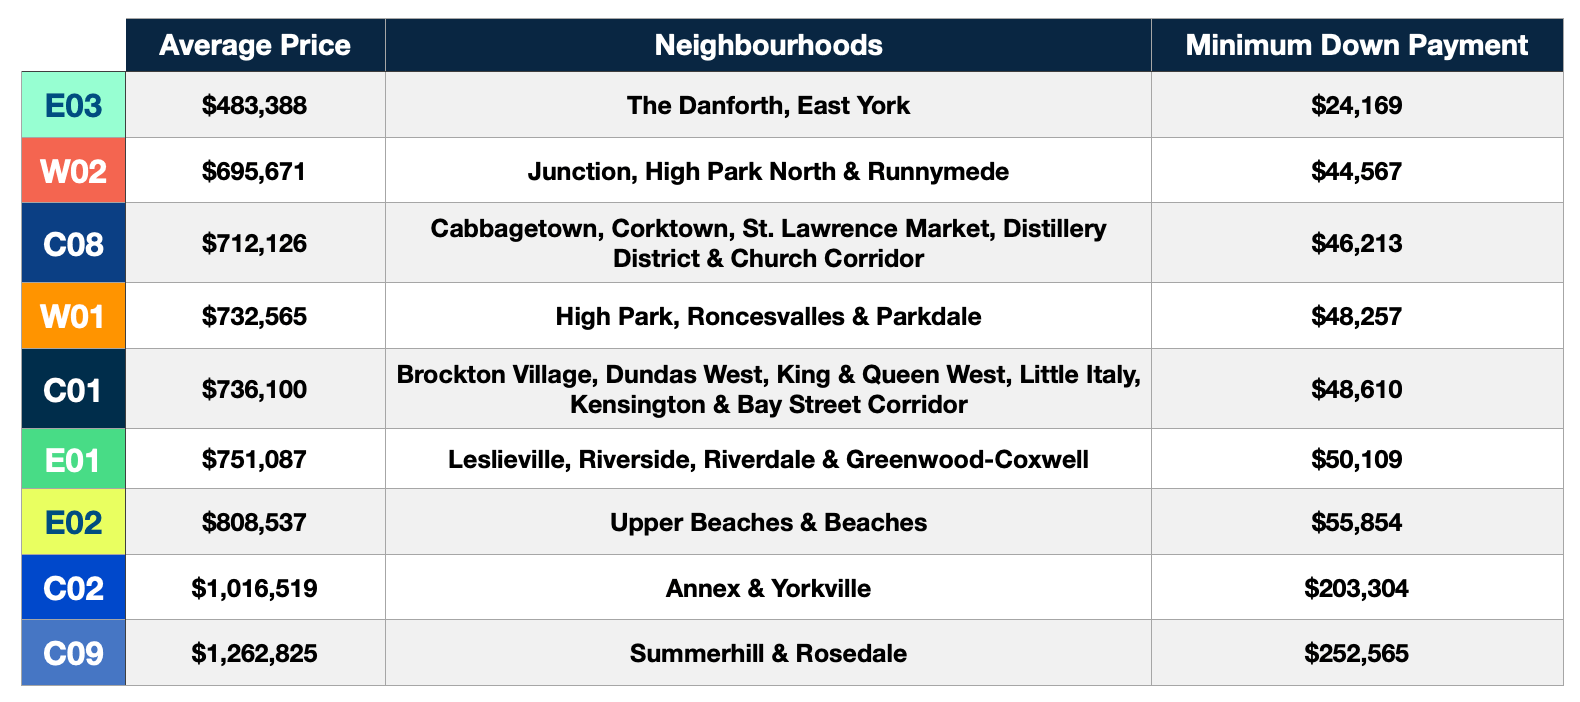 average cost to buy a condo per neighbourhood